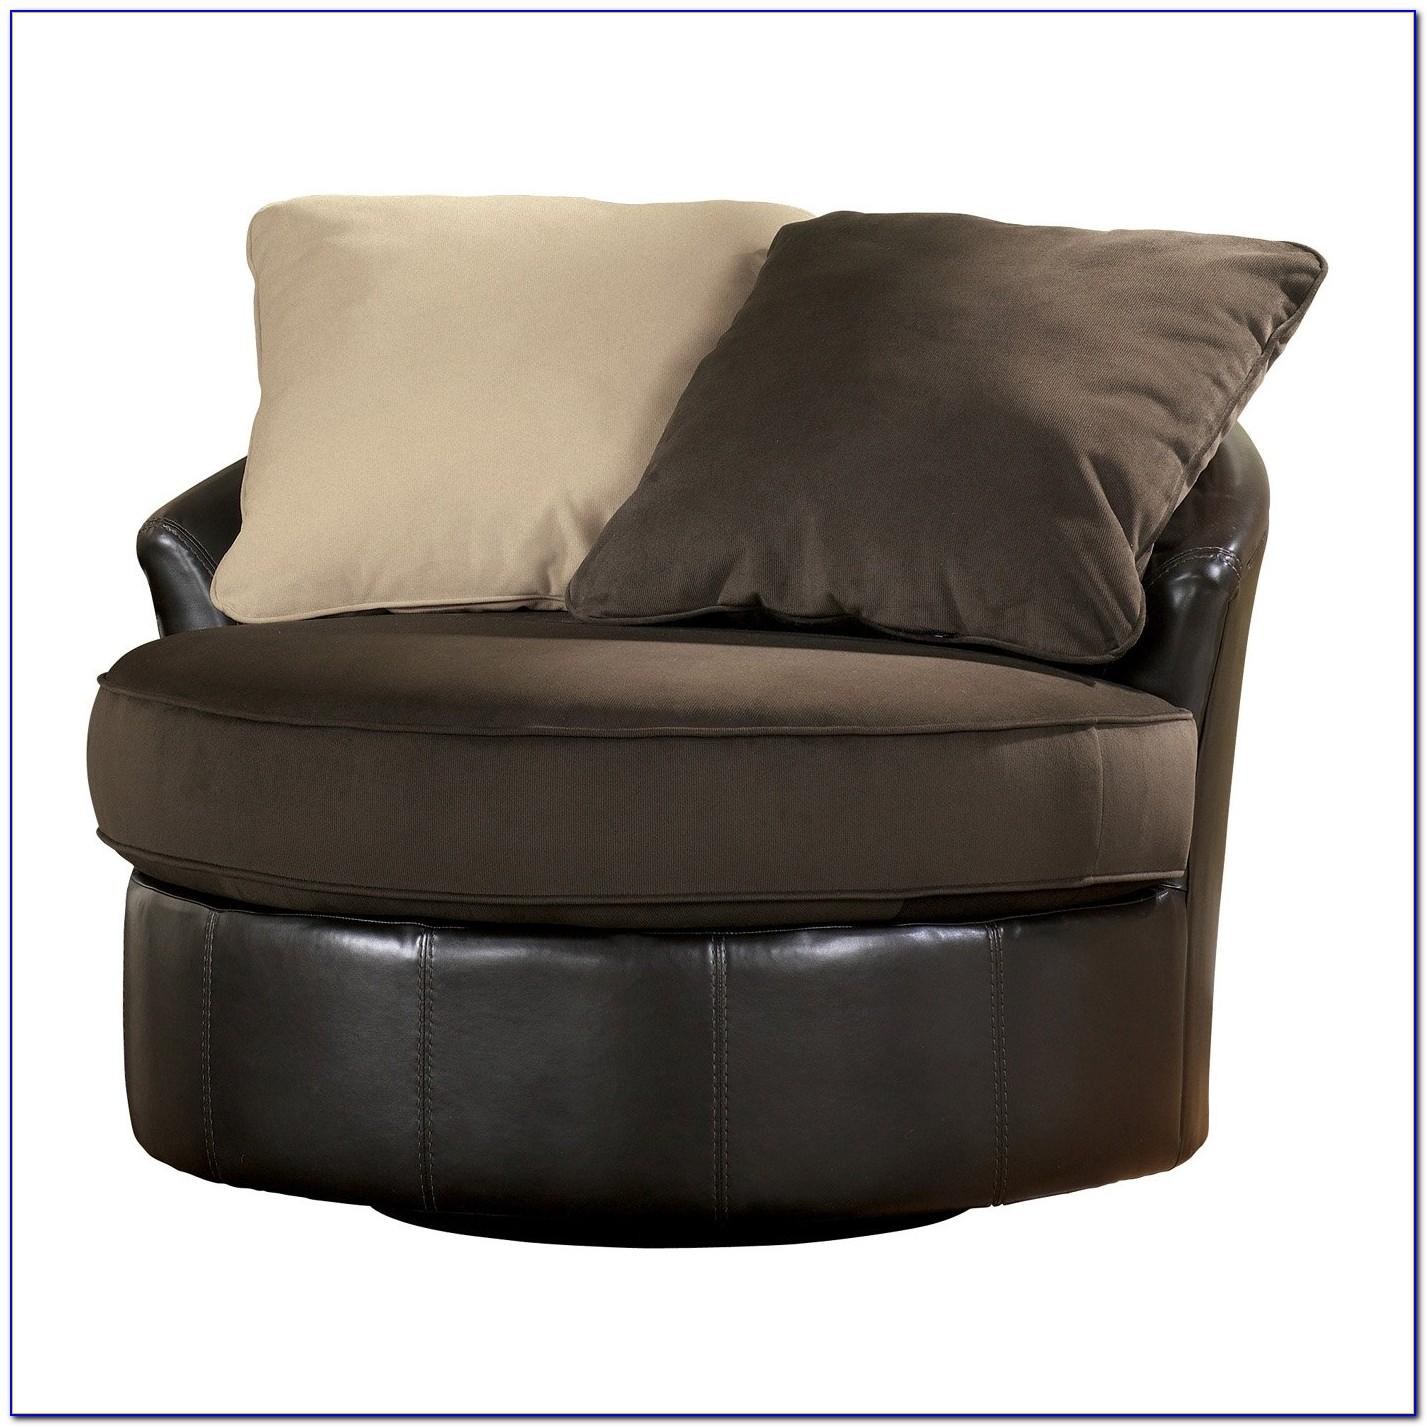 Round Swivel Chair American Furniture